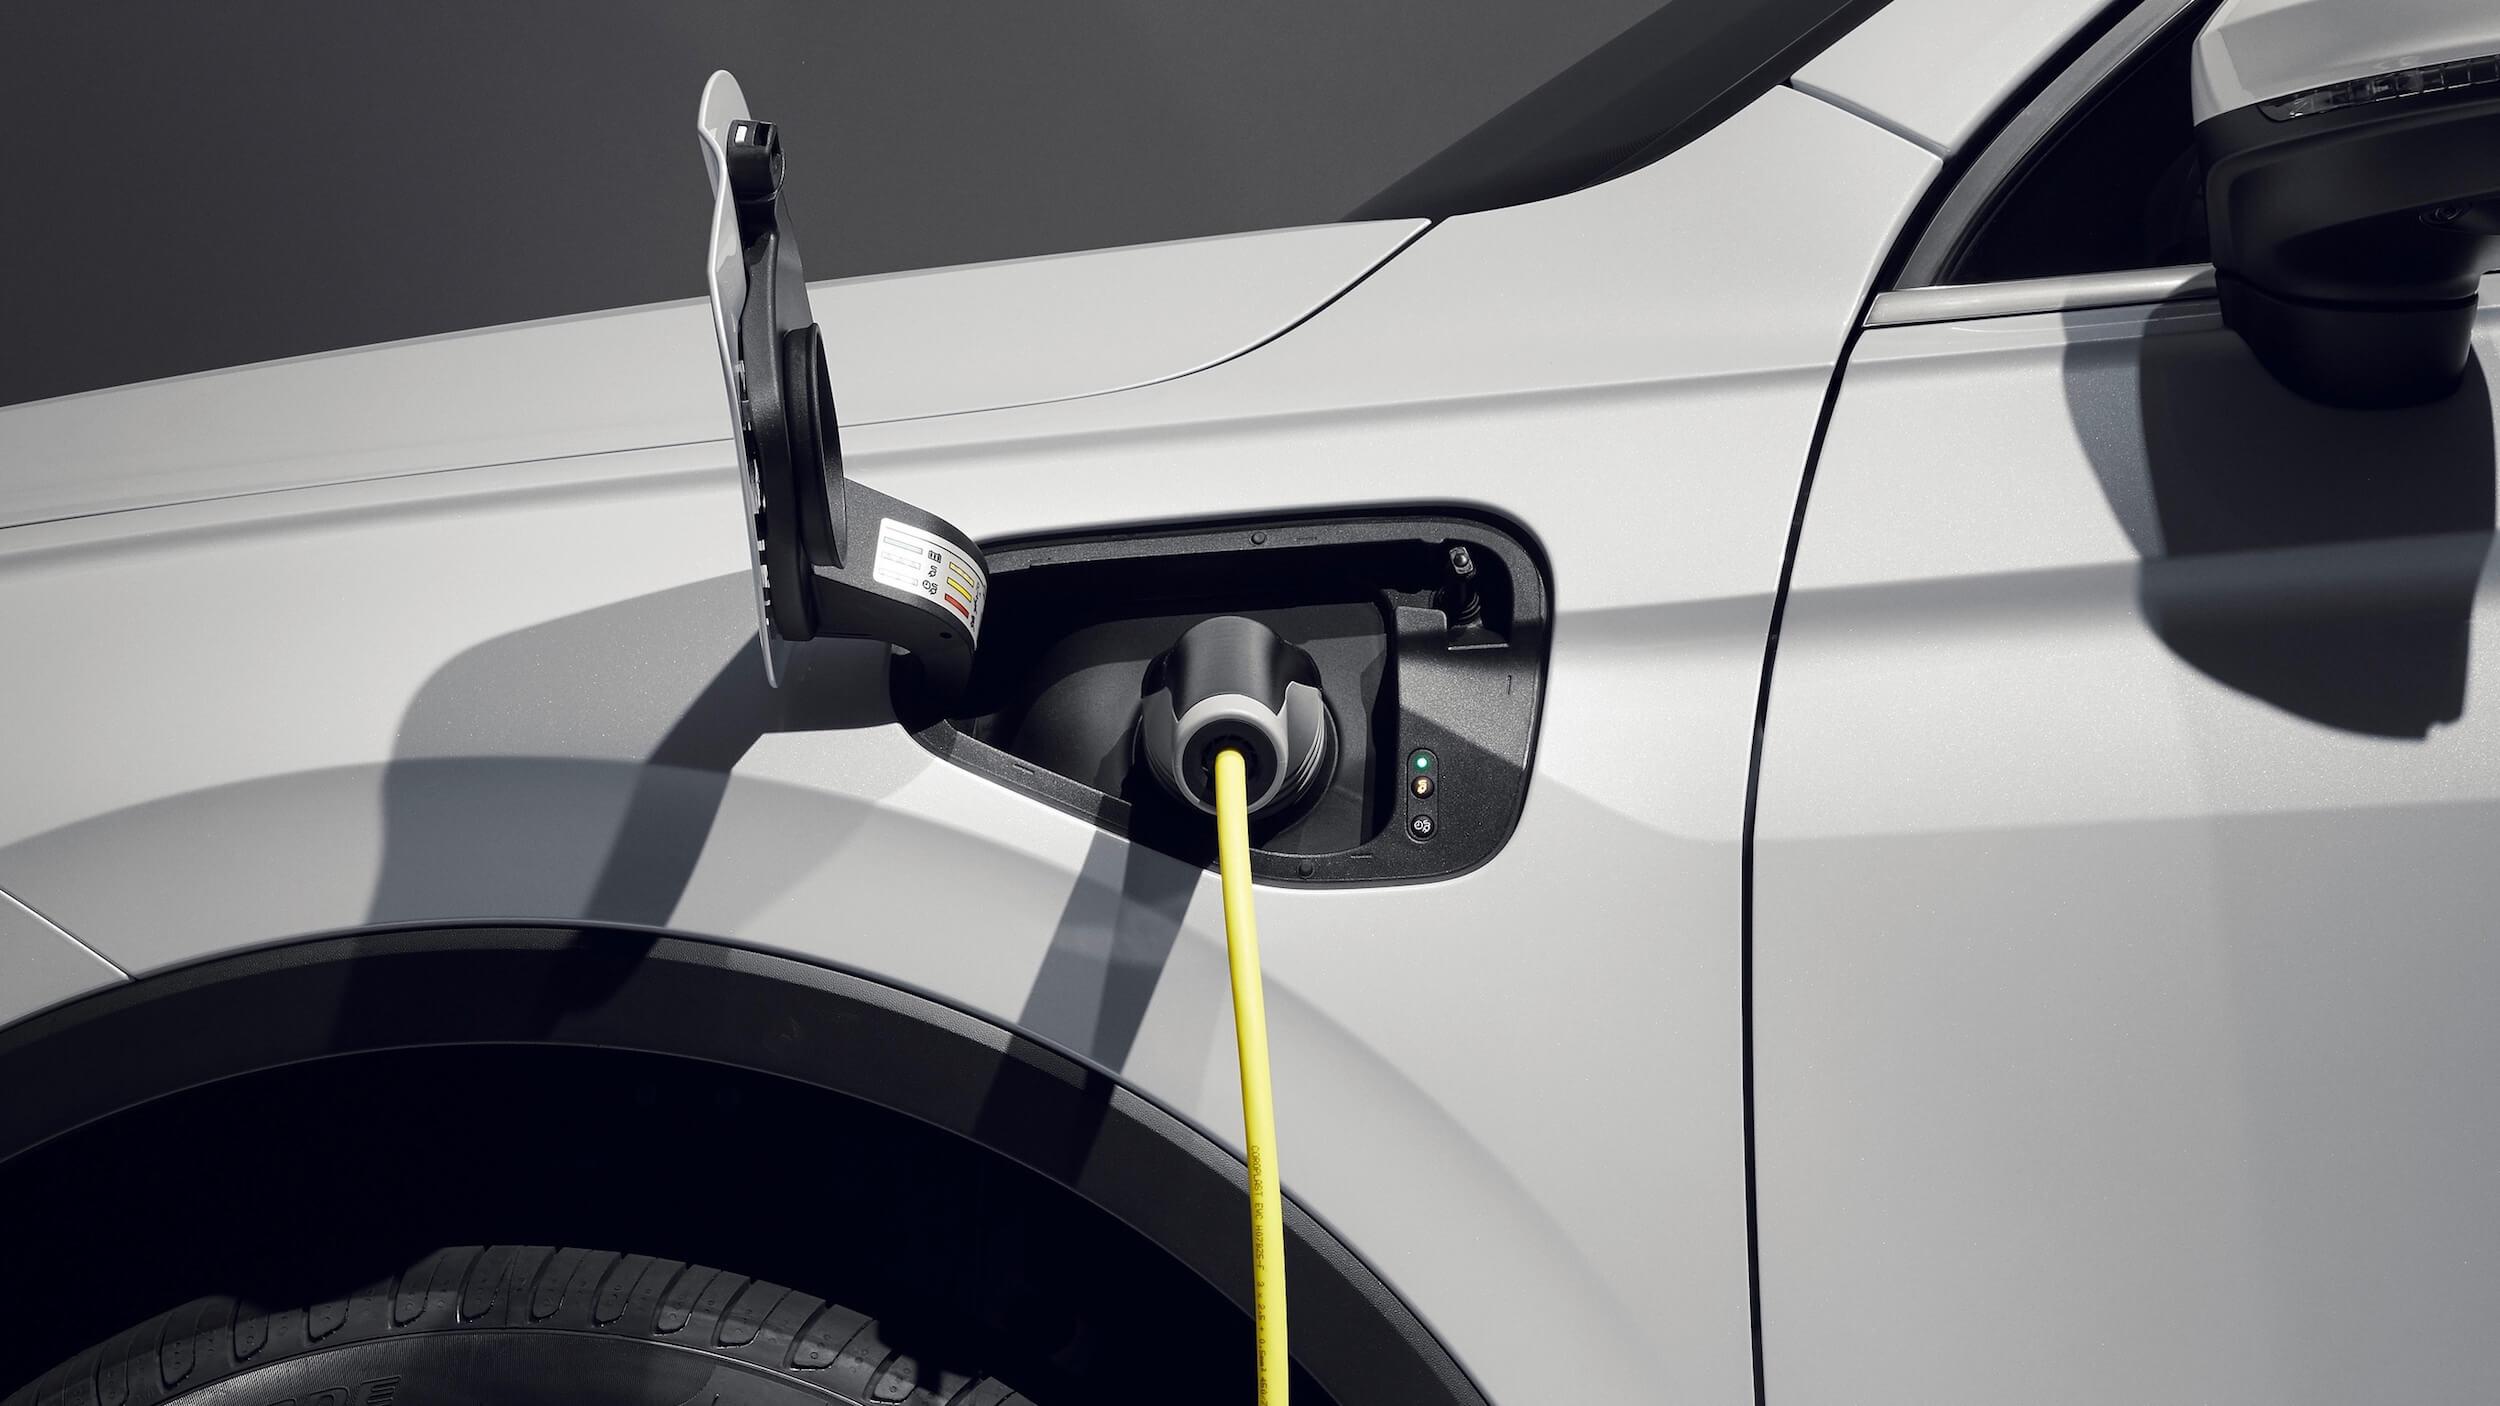 VW Tiguan eHybrid laadkabel